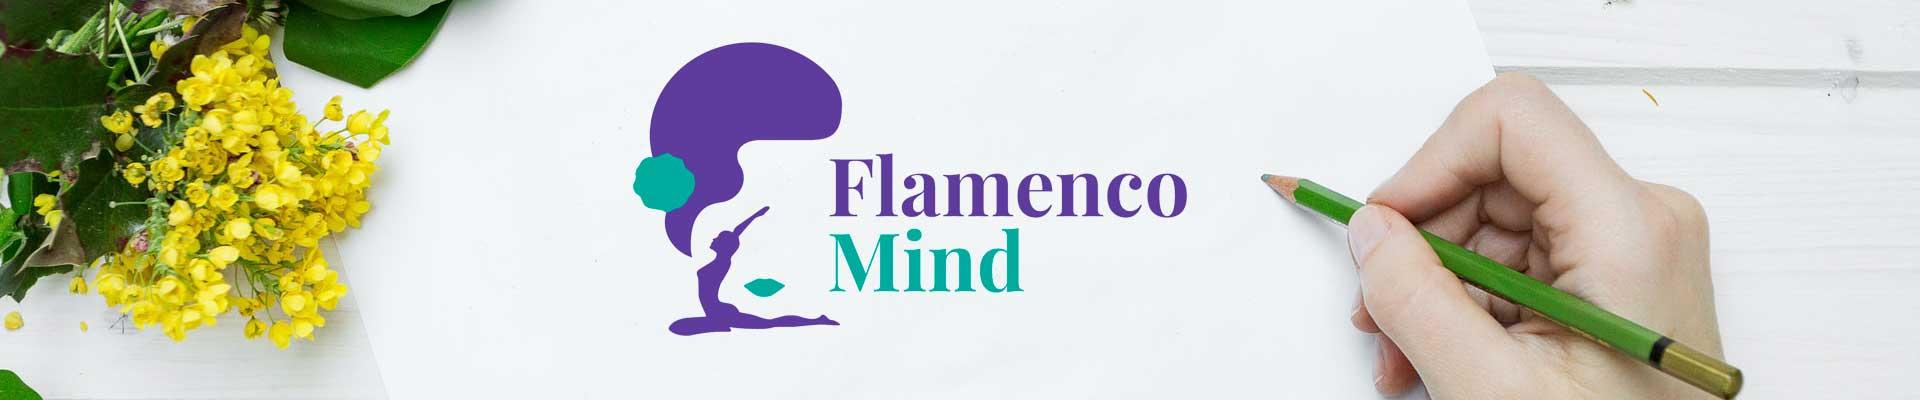 clases online de baile flamenco consciente - FlamencoMind